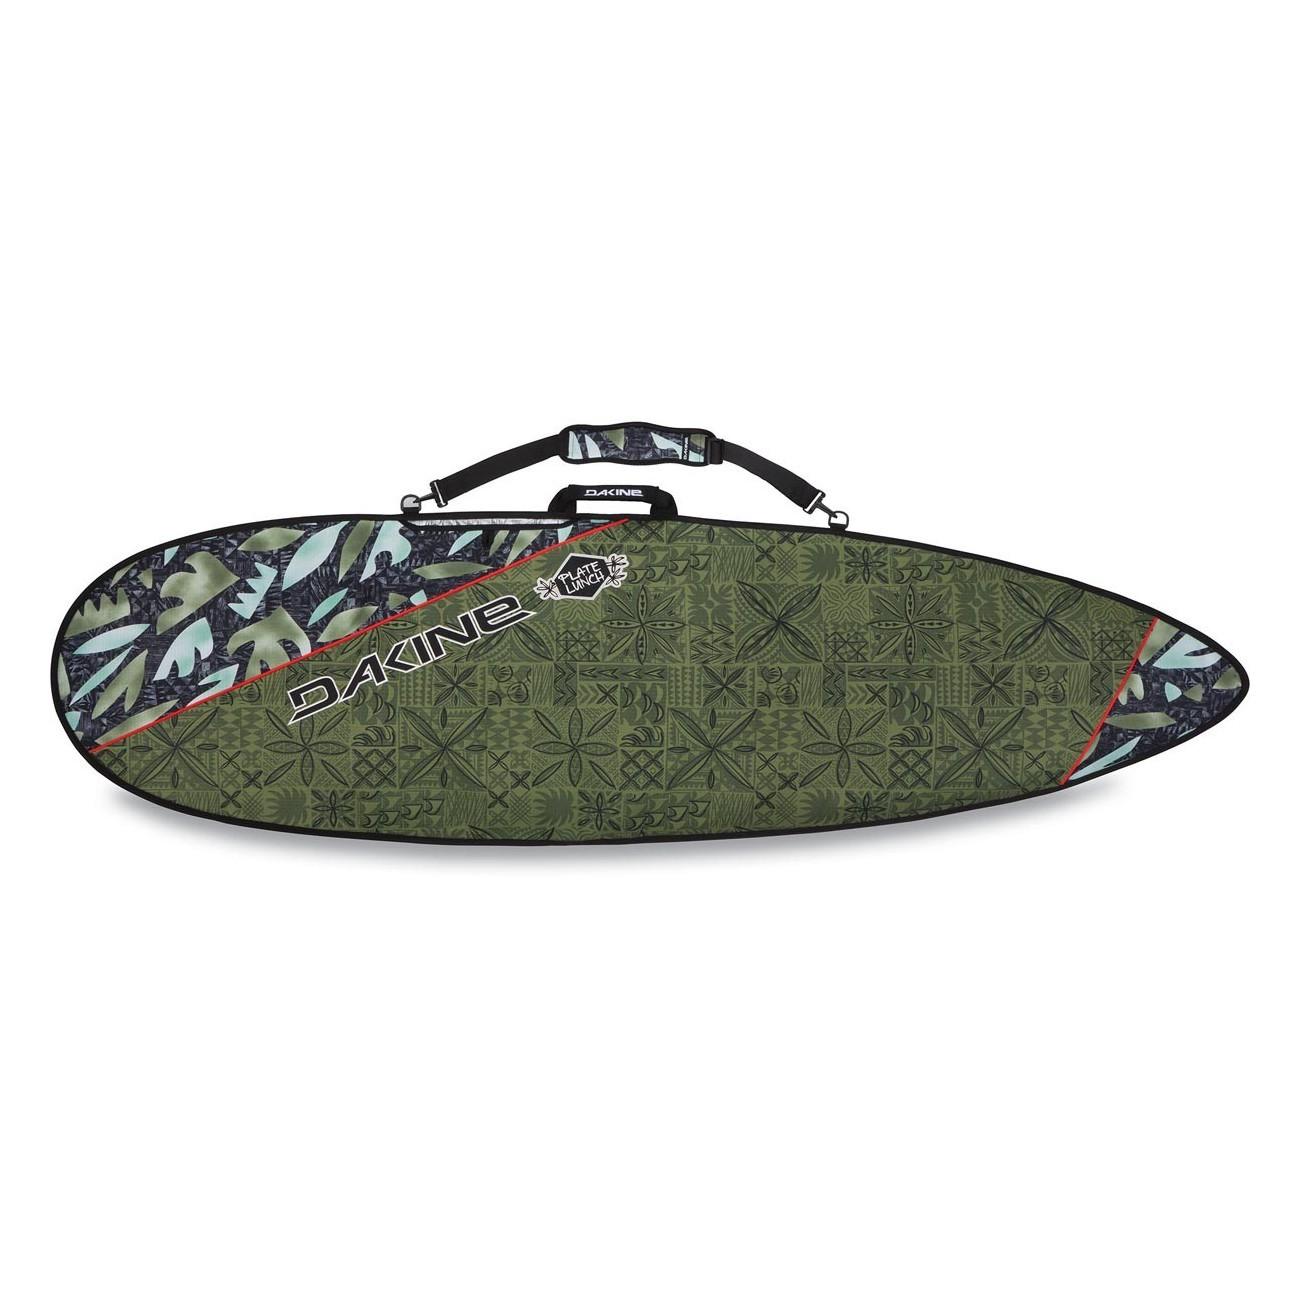 Tienda Online Tu Ropa De Surf Daylight Snowboard Y Urbana Dakine wqTUqd